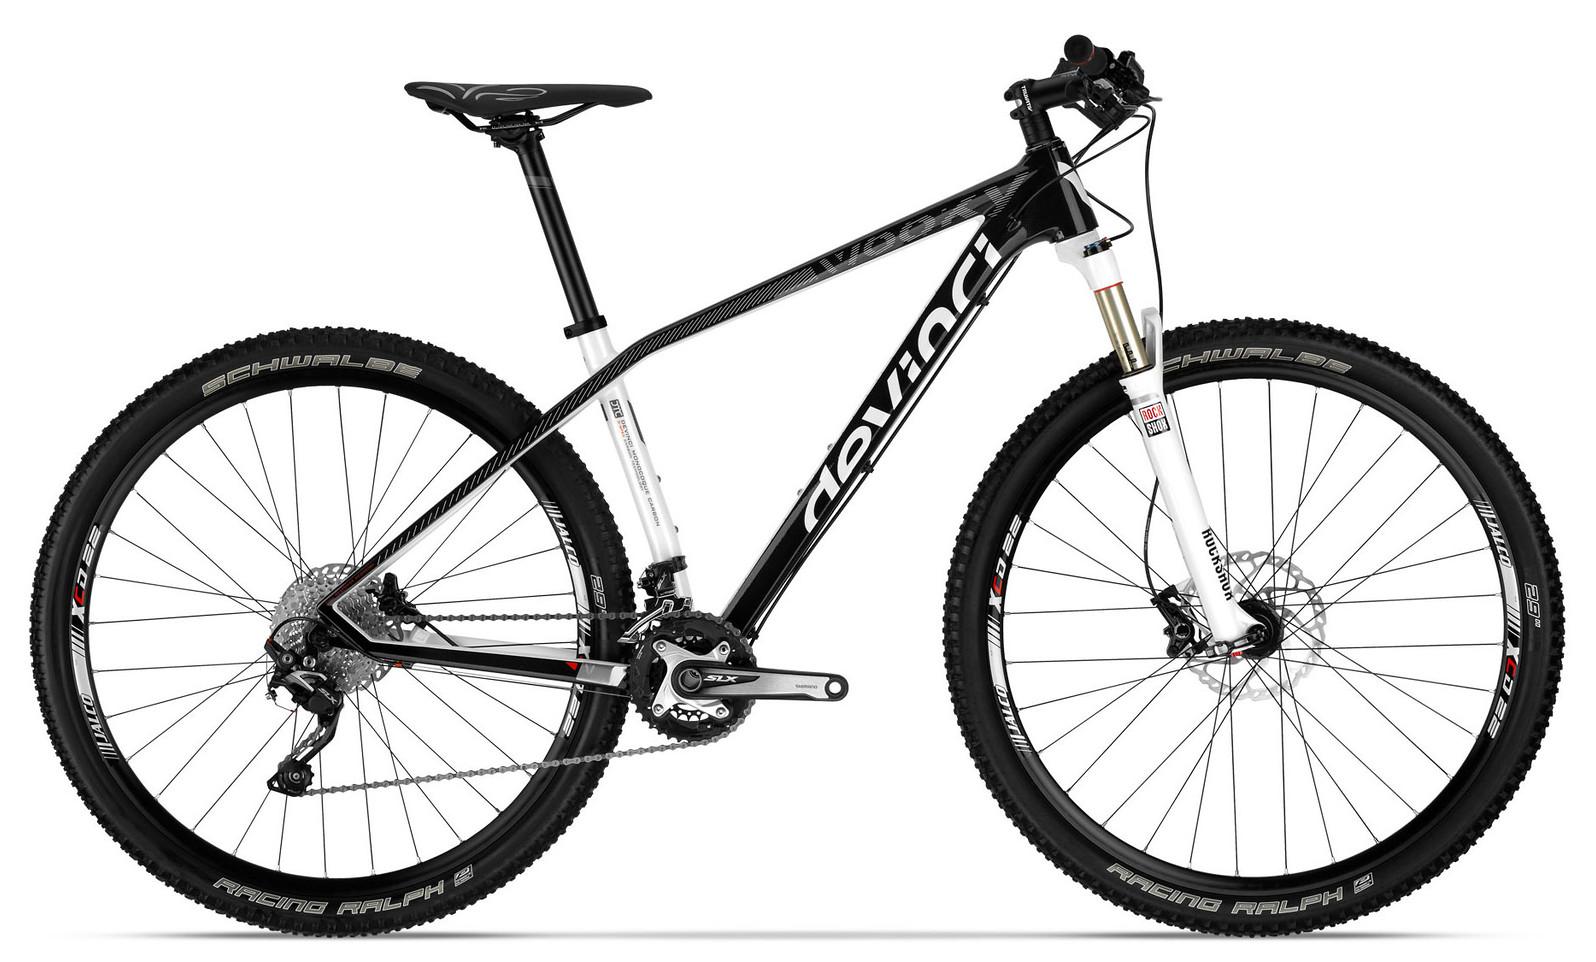 Bike - 2014 Devinci Wooky Carbon RC